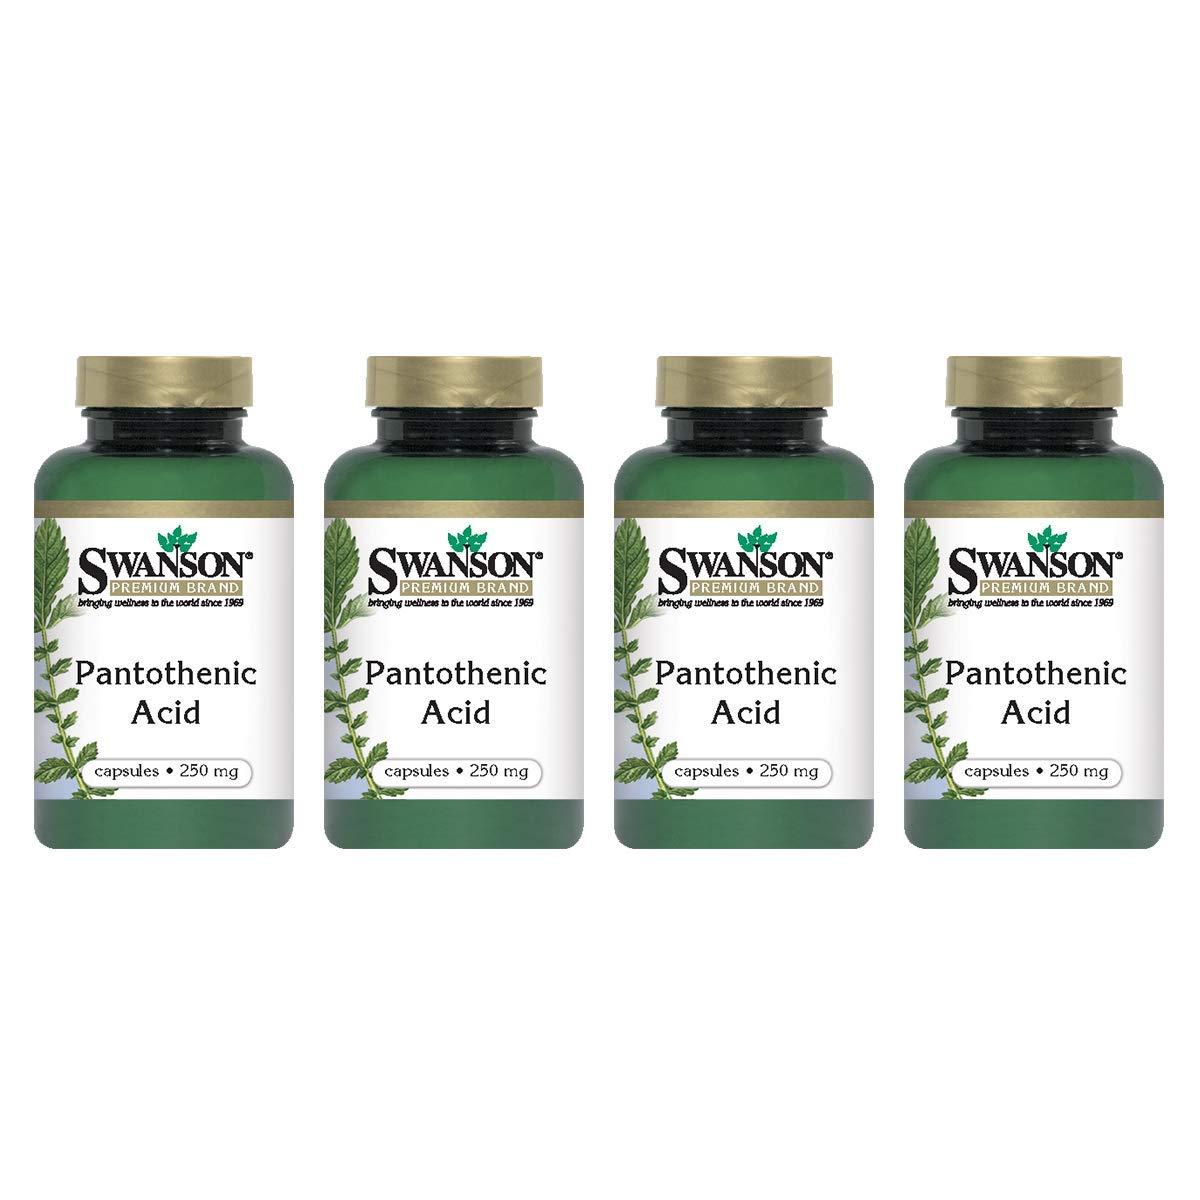 Swanson Pantothenic Acid (Vitamin B-5) Energy Metabolism Nerve Function Support 250 mg 250 Capsules (Caps) (4 Pack)